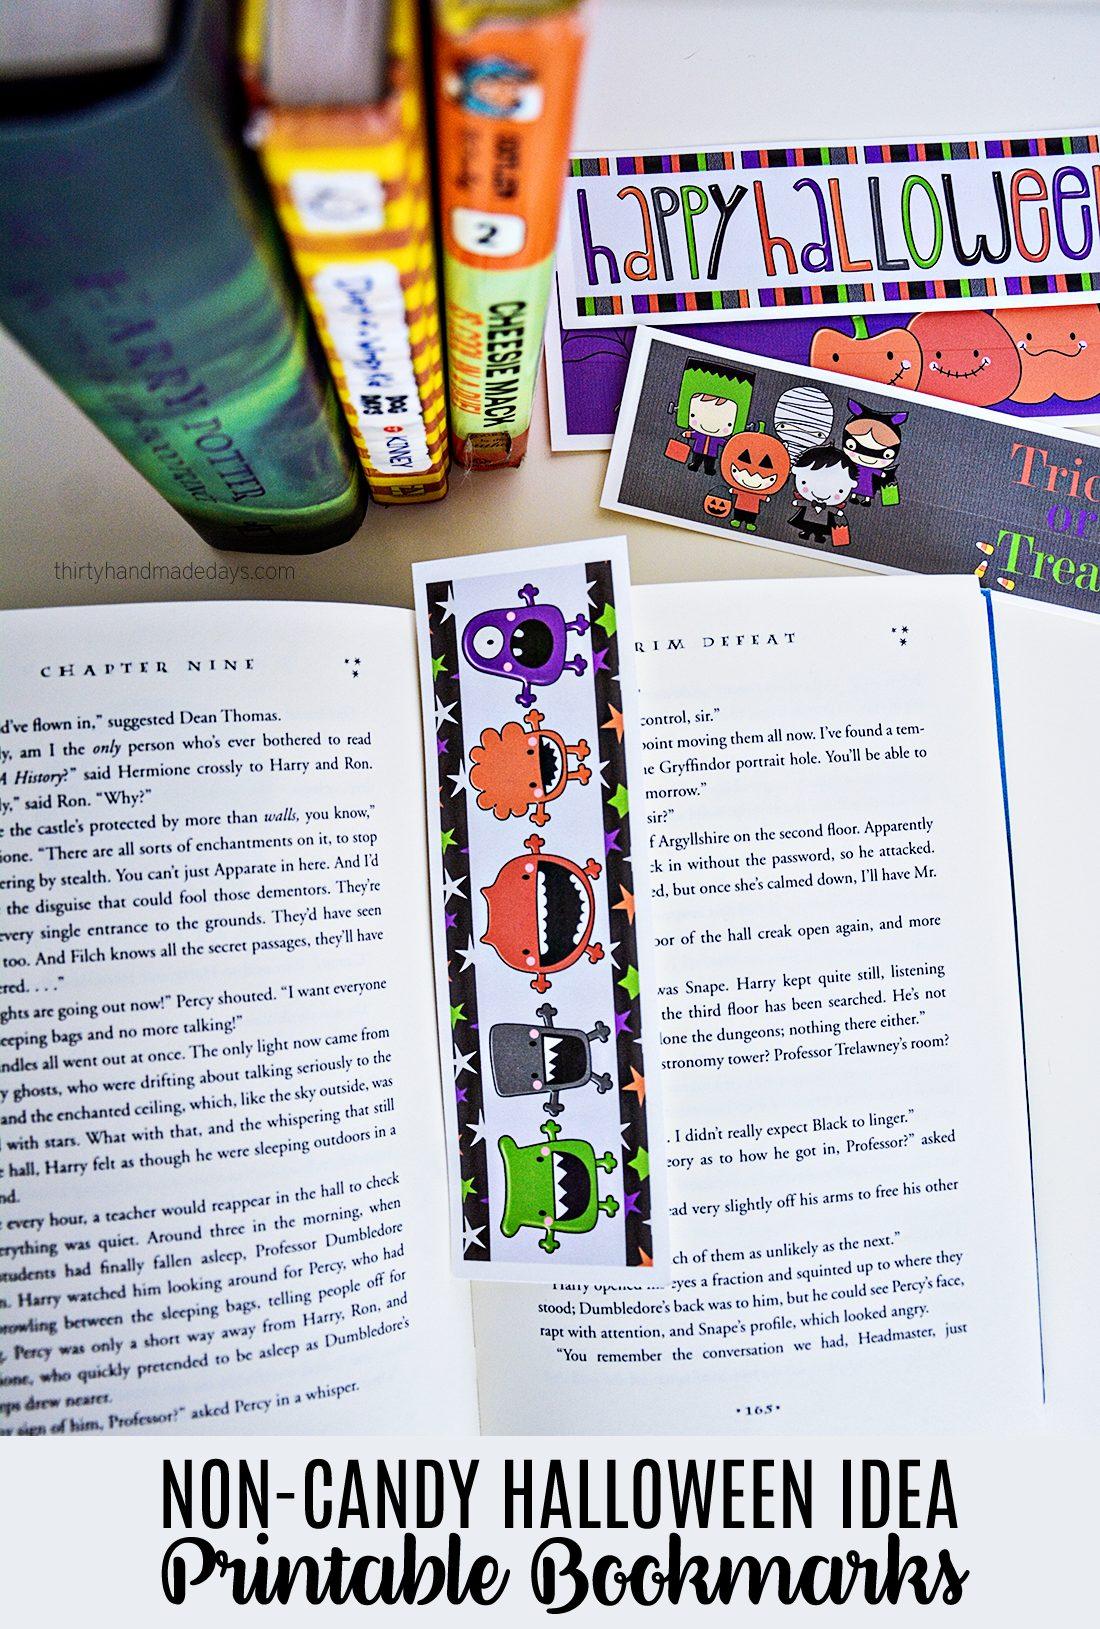 Non Candy Halloween Idea- Printable Bookmarks: these are great for classroom treats! via www.thirtyhandmadedays.com